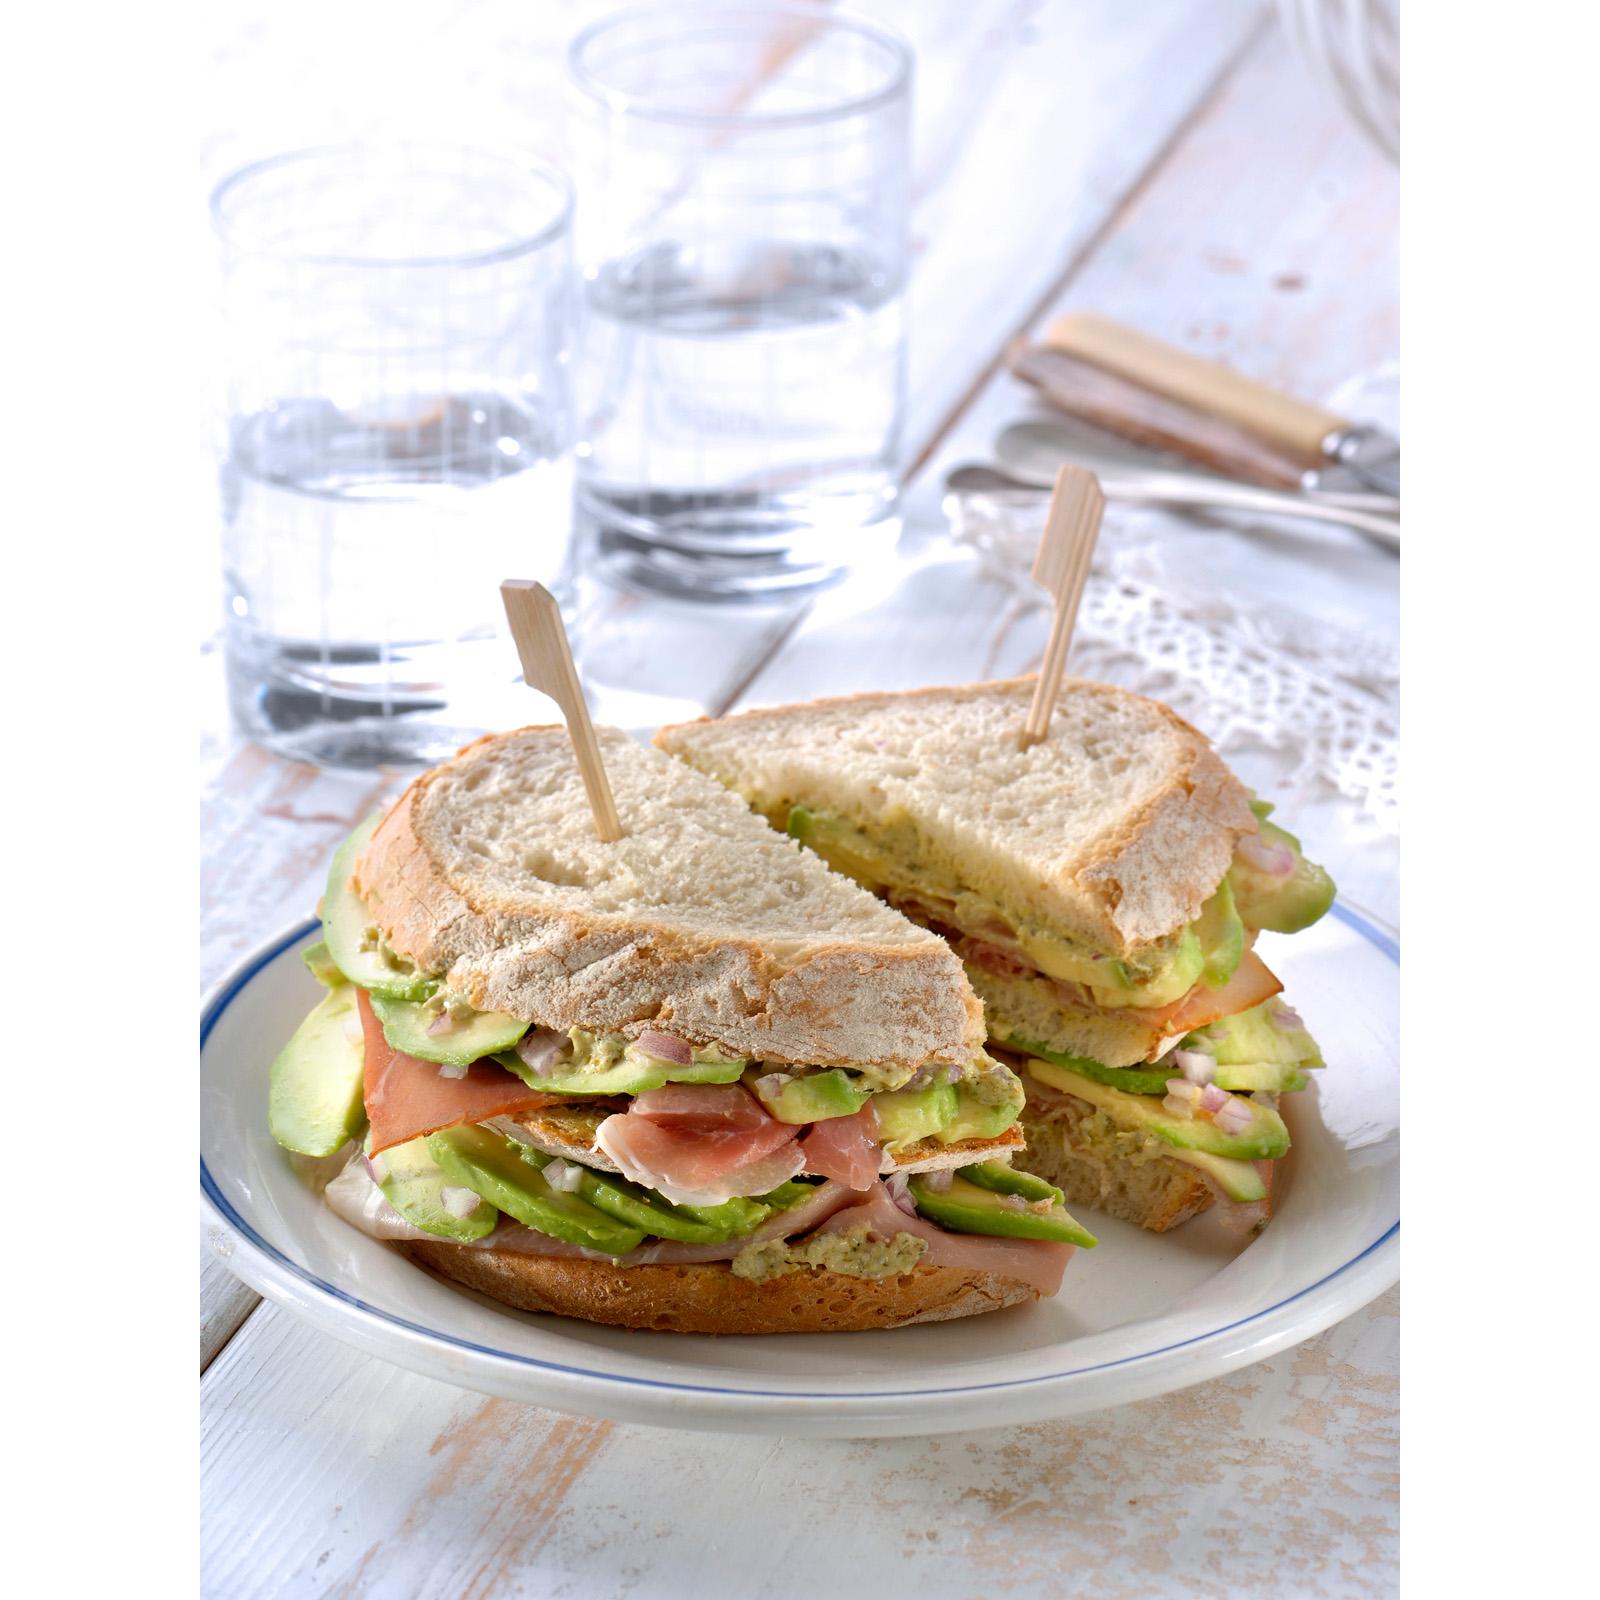 Clubsandwich met rauwe ham, avocado en basilicum